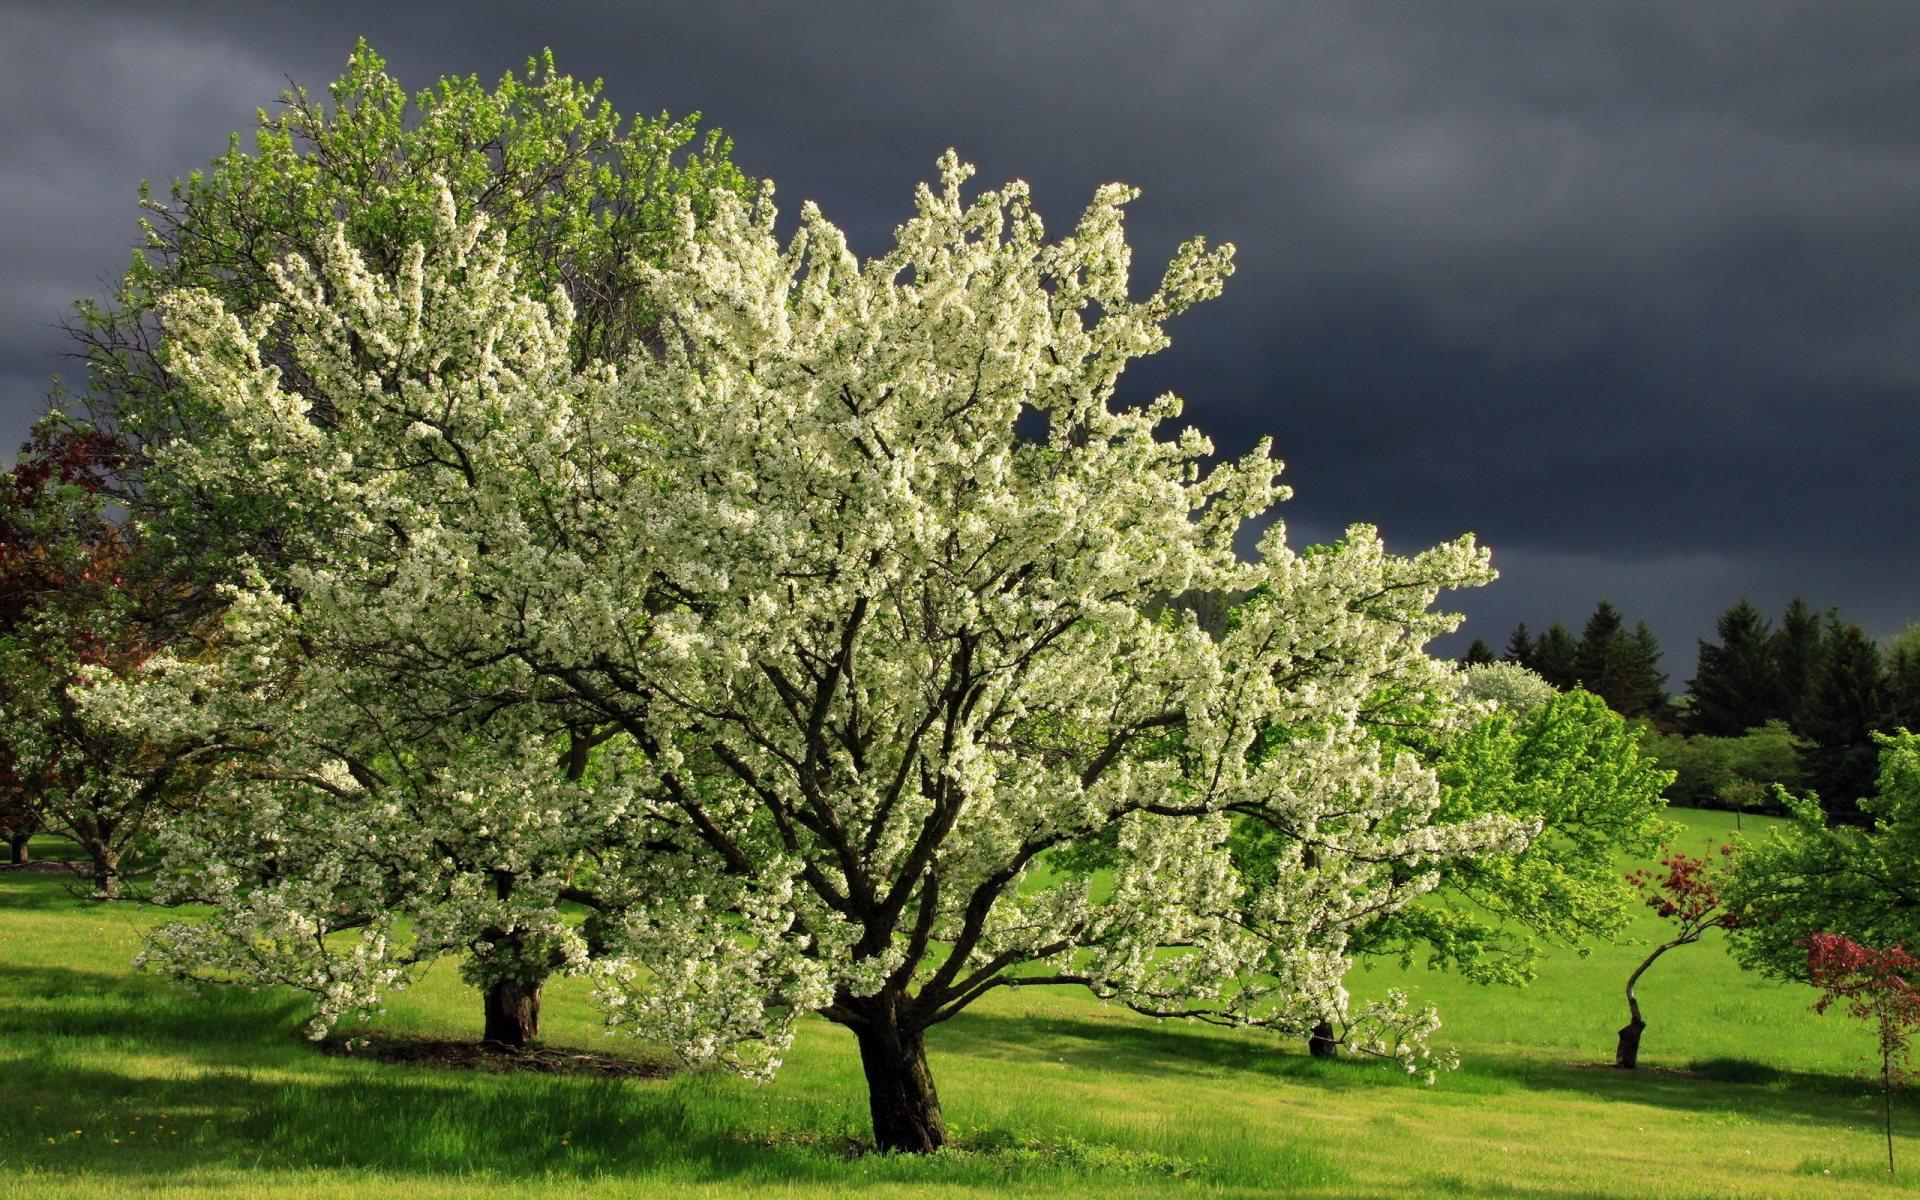 Top Anime Wallpaper Sites Spring Season Trees Full Hd Desktop Wallpapers 1080p